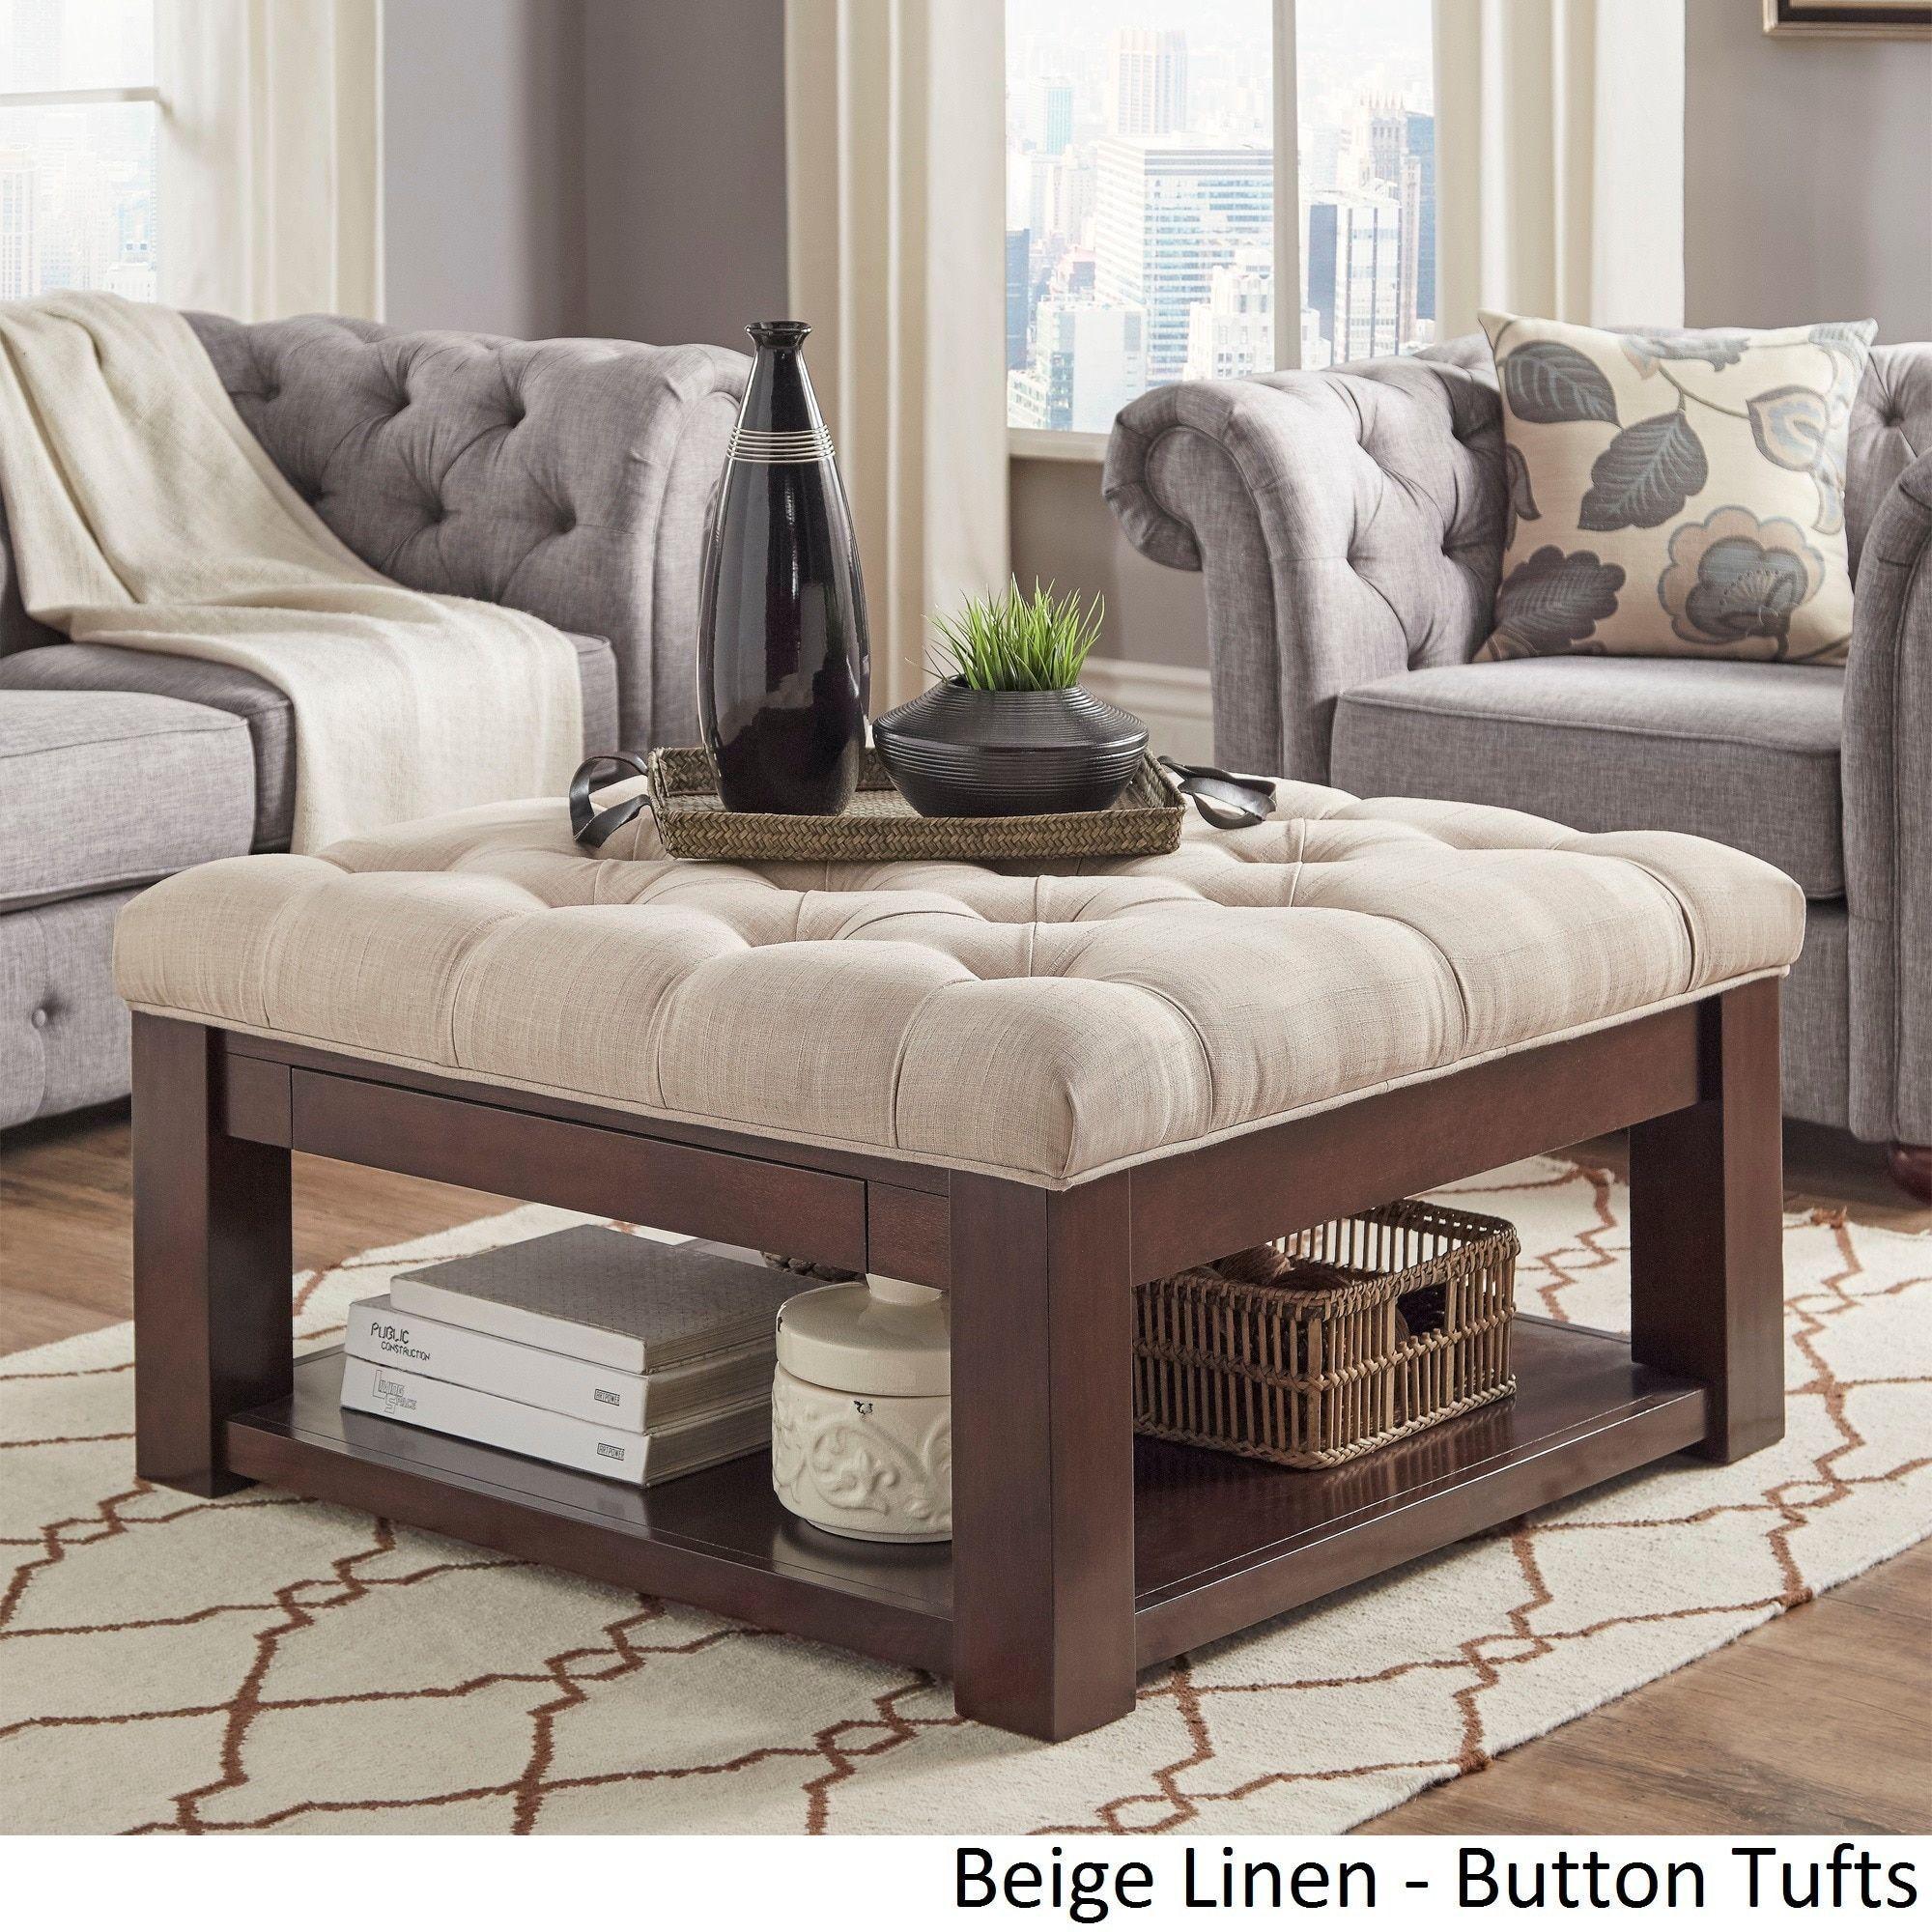 Lennon Espresso Square Storage Ottoman Coffee Table By Inspire Q Clic Beige Linen On Tufts Fabric